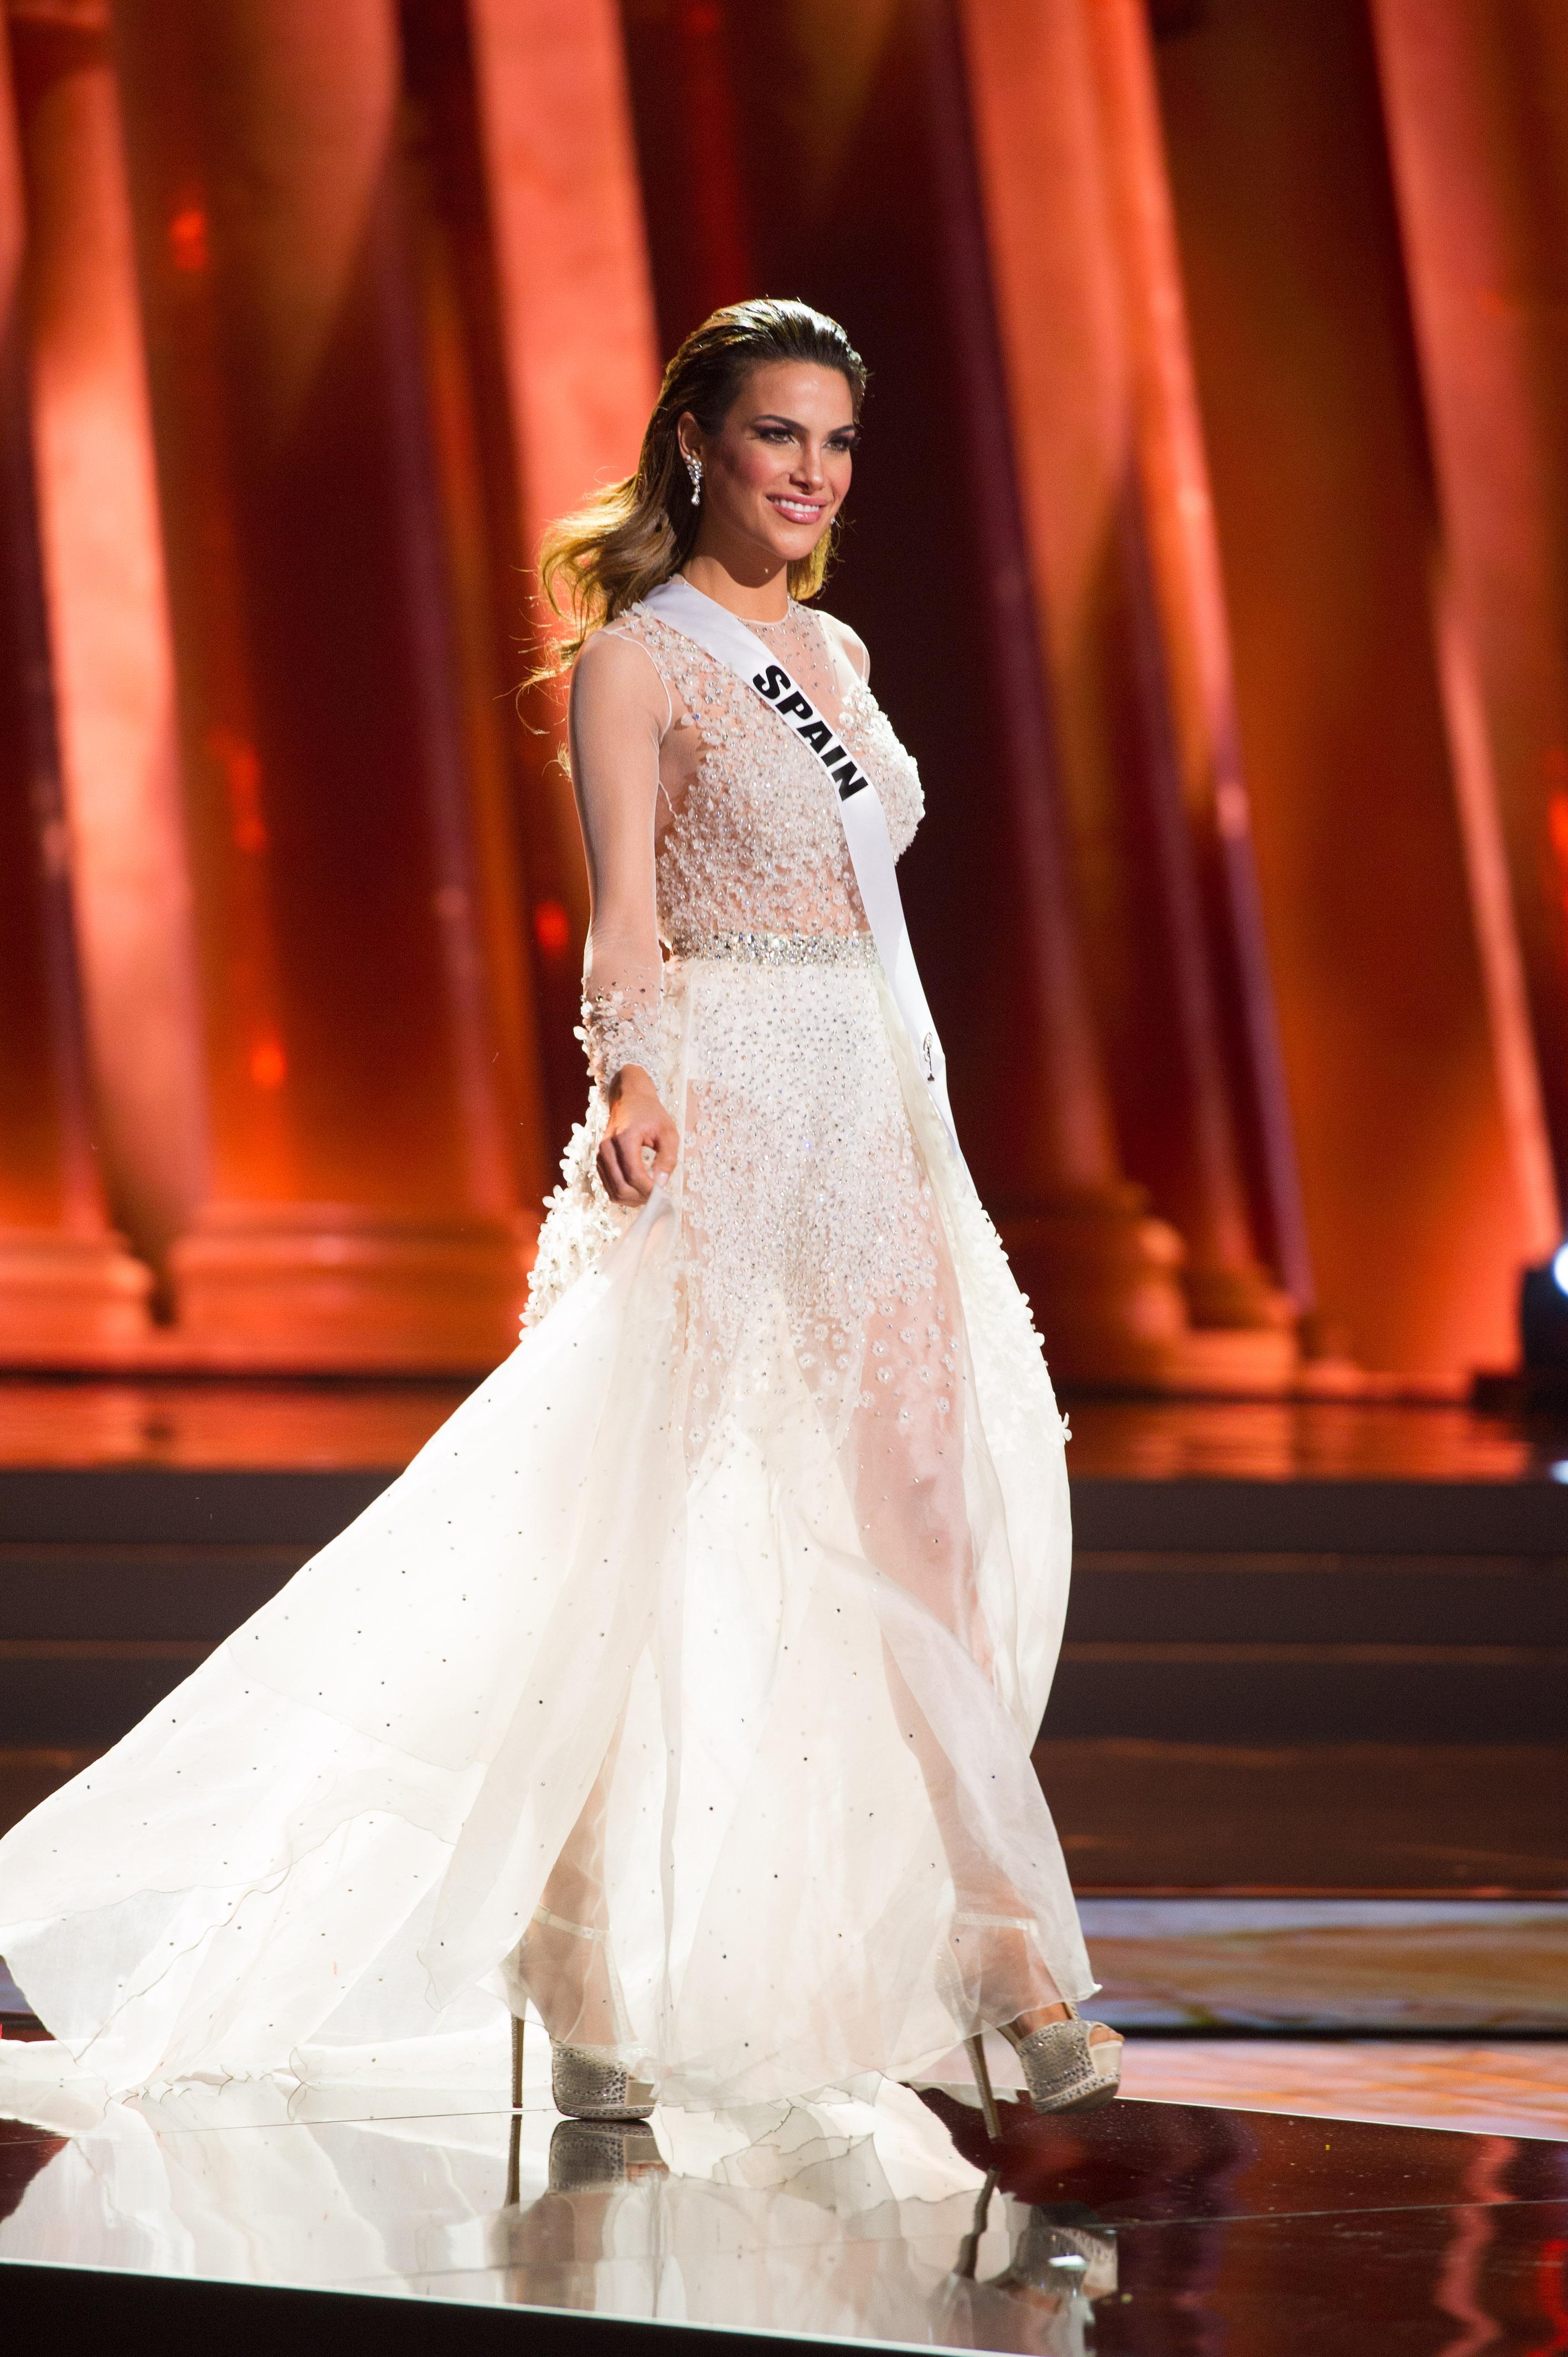 Preliminary Competition Evening Gown. 16 Diciembre | Bellezas Hispanas